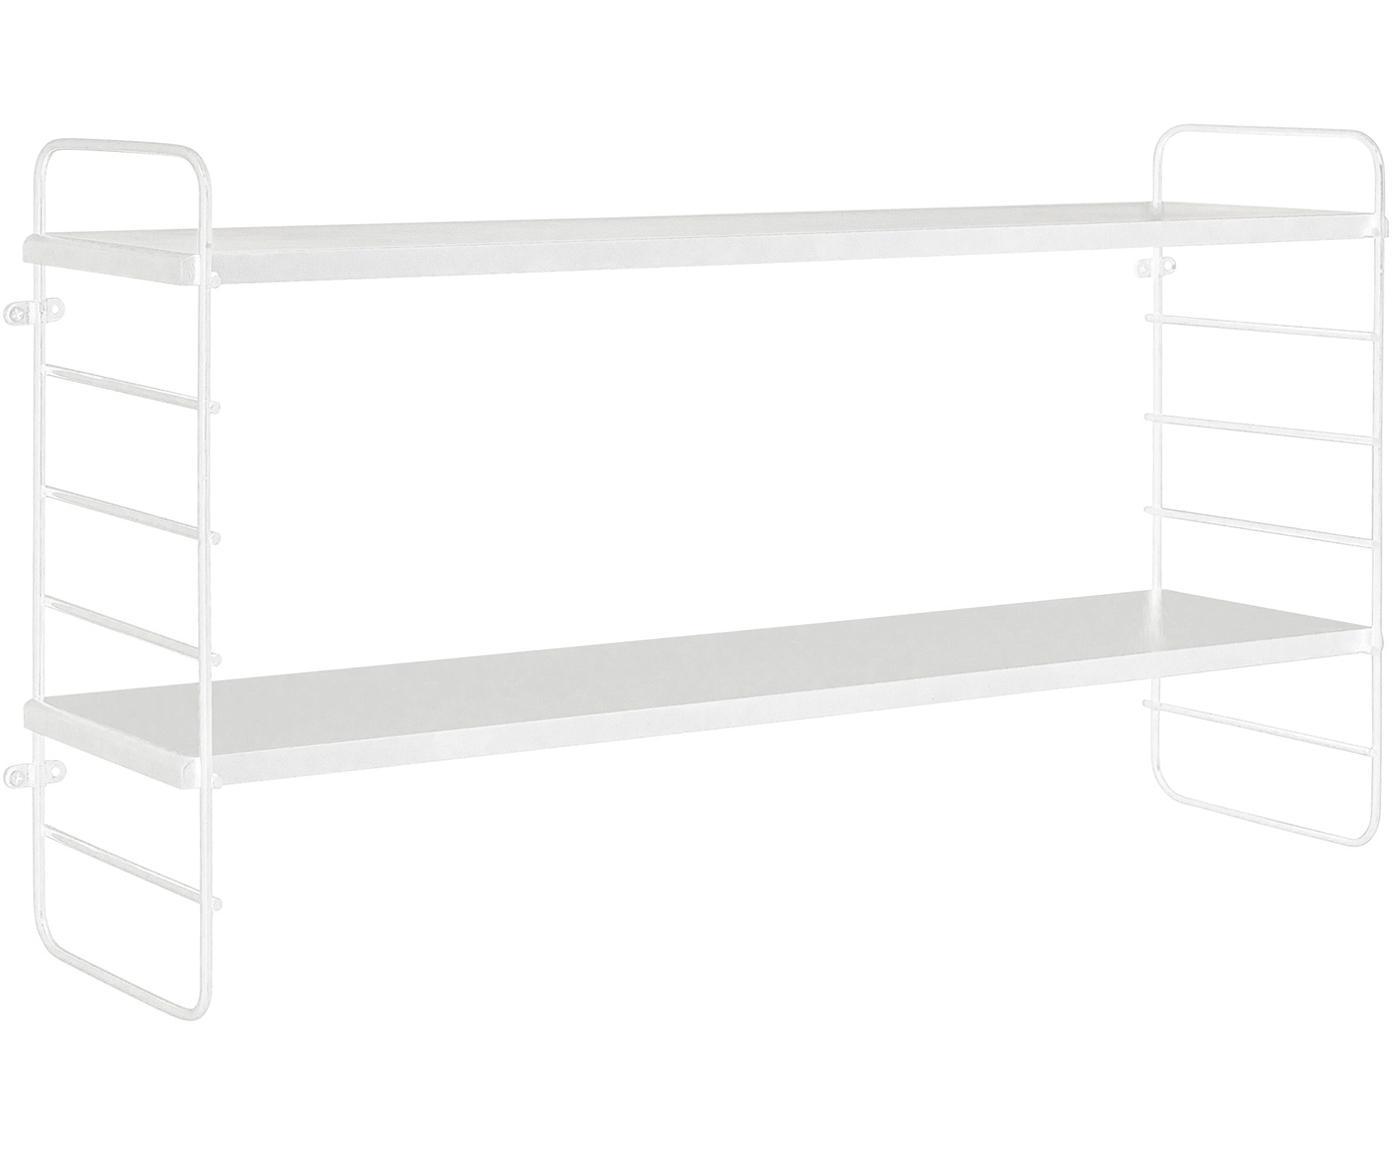 Wandrek North, Frame: gelakt metaal, Wit, 65 x 35 cm